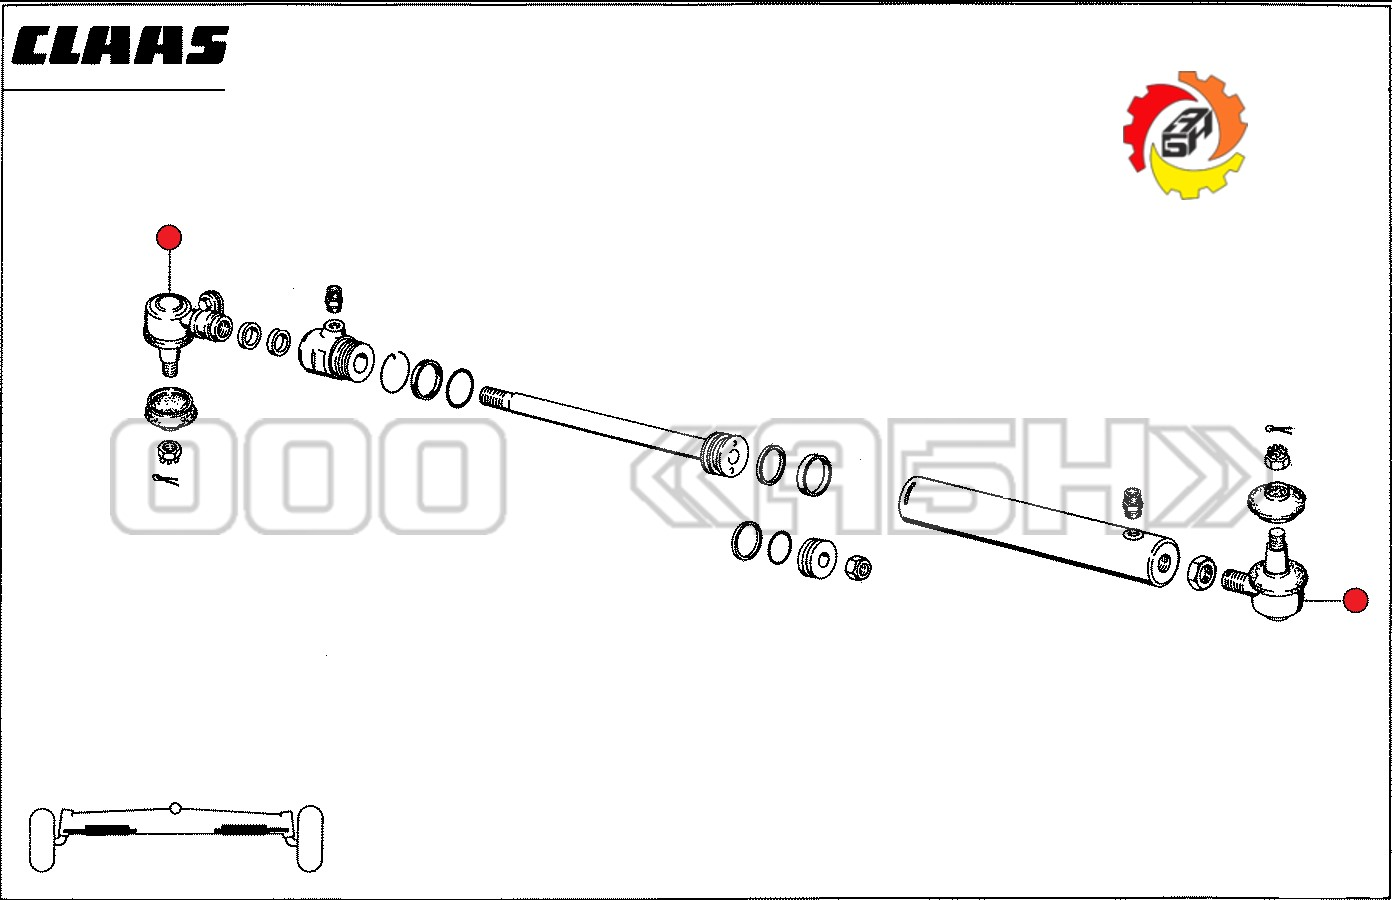 Шарнир шаровой Claas (0006689980 / 0007708910 / 6689980 / 7708910 / 668998.0 / 770891.0)